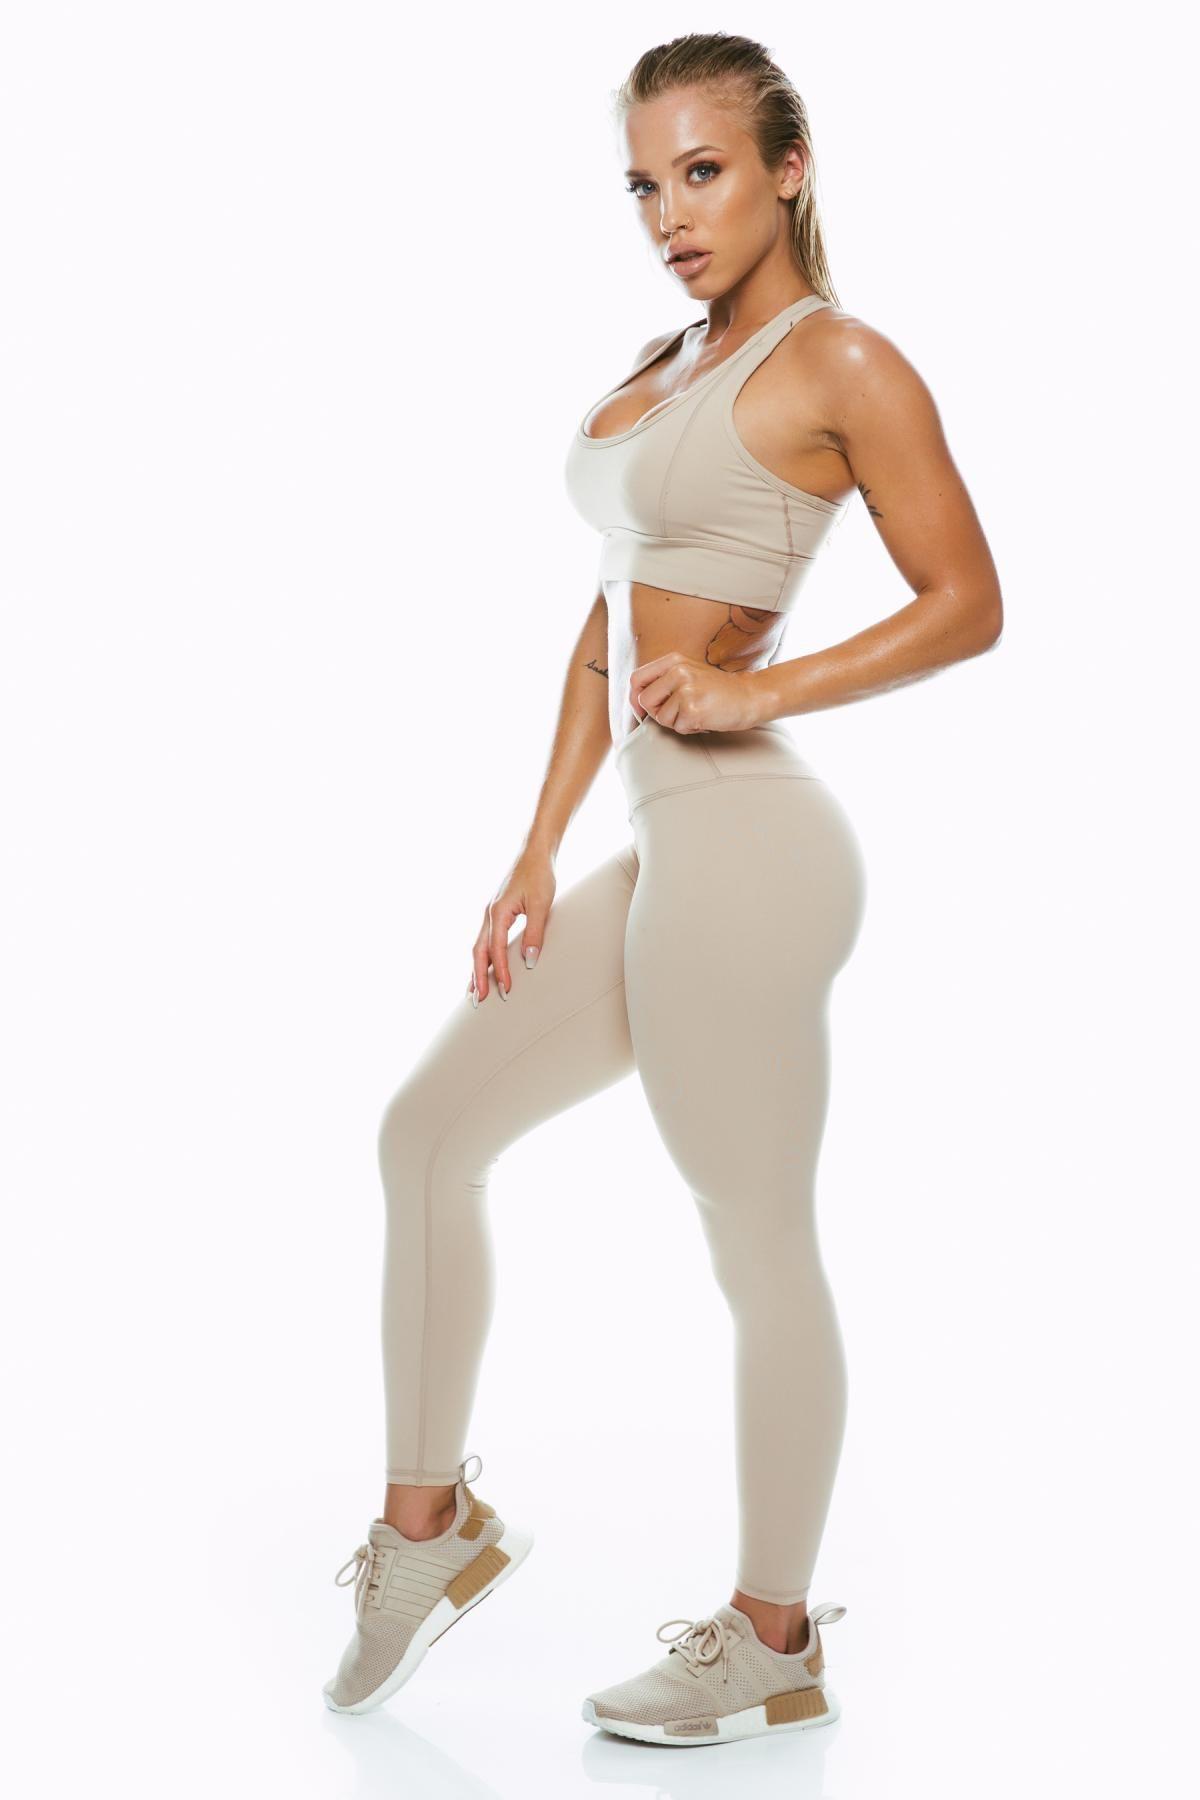 6a45845882241 Nude Mid Waist Leggings in 2019 | Photoshoot | Nude leggings, Tammy ...